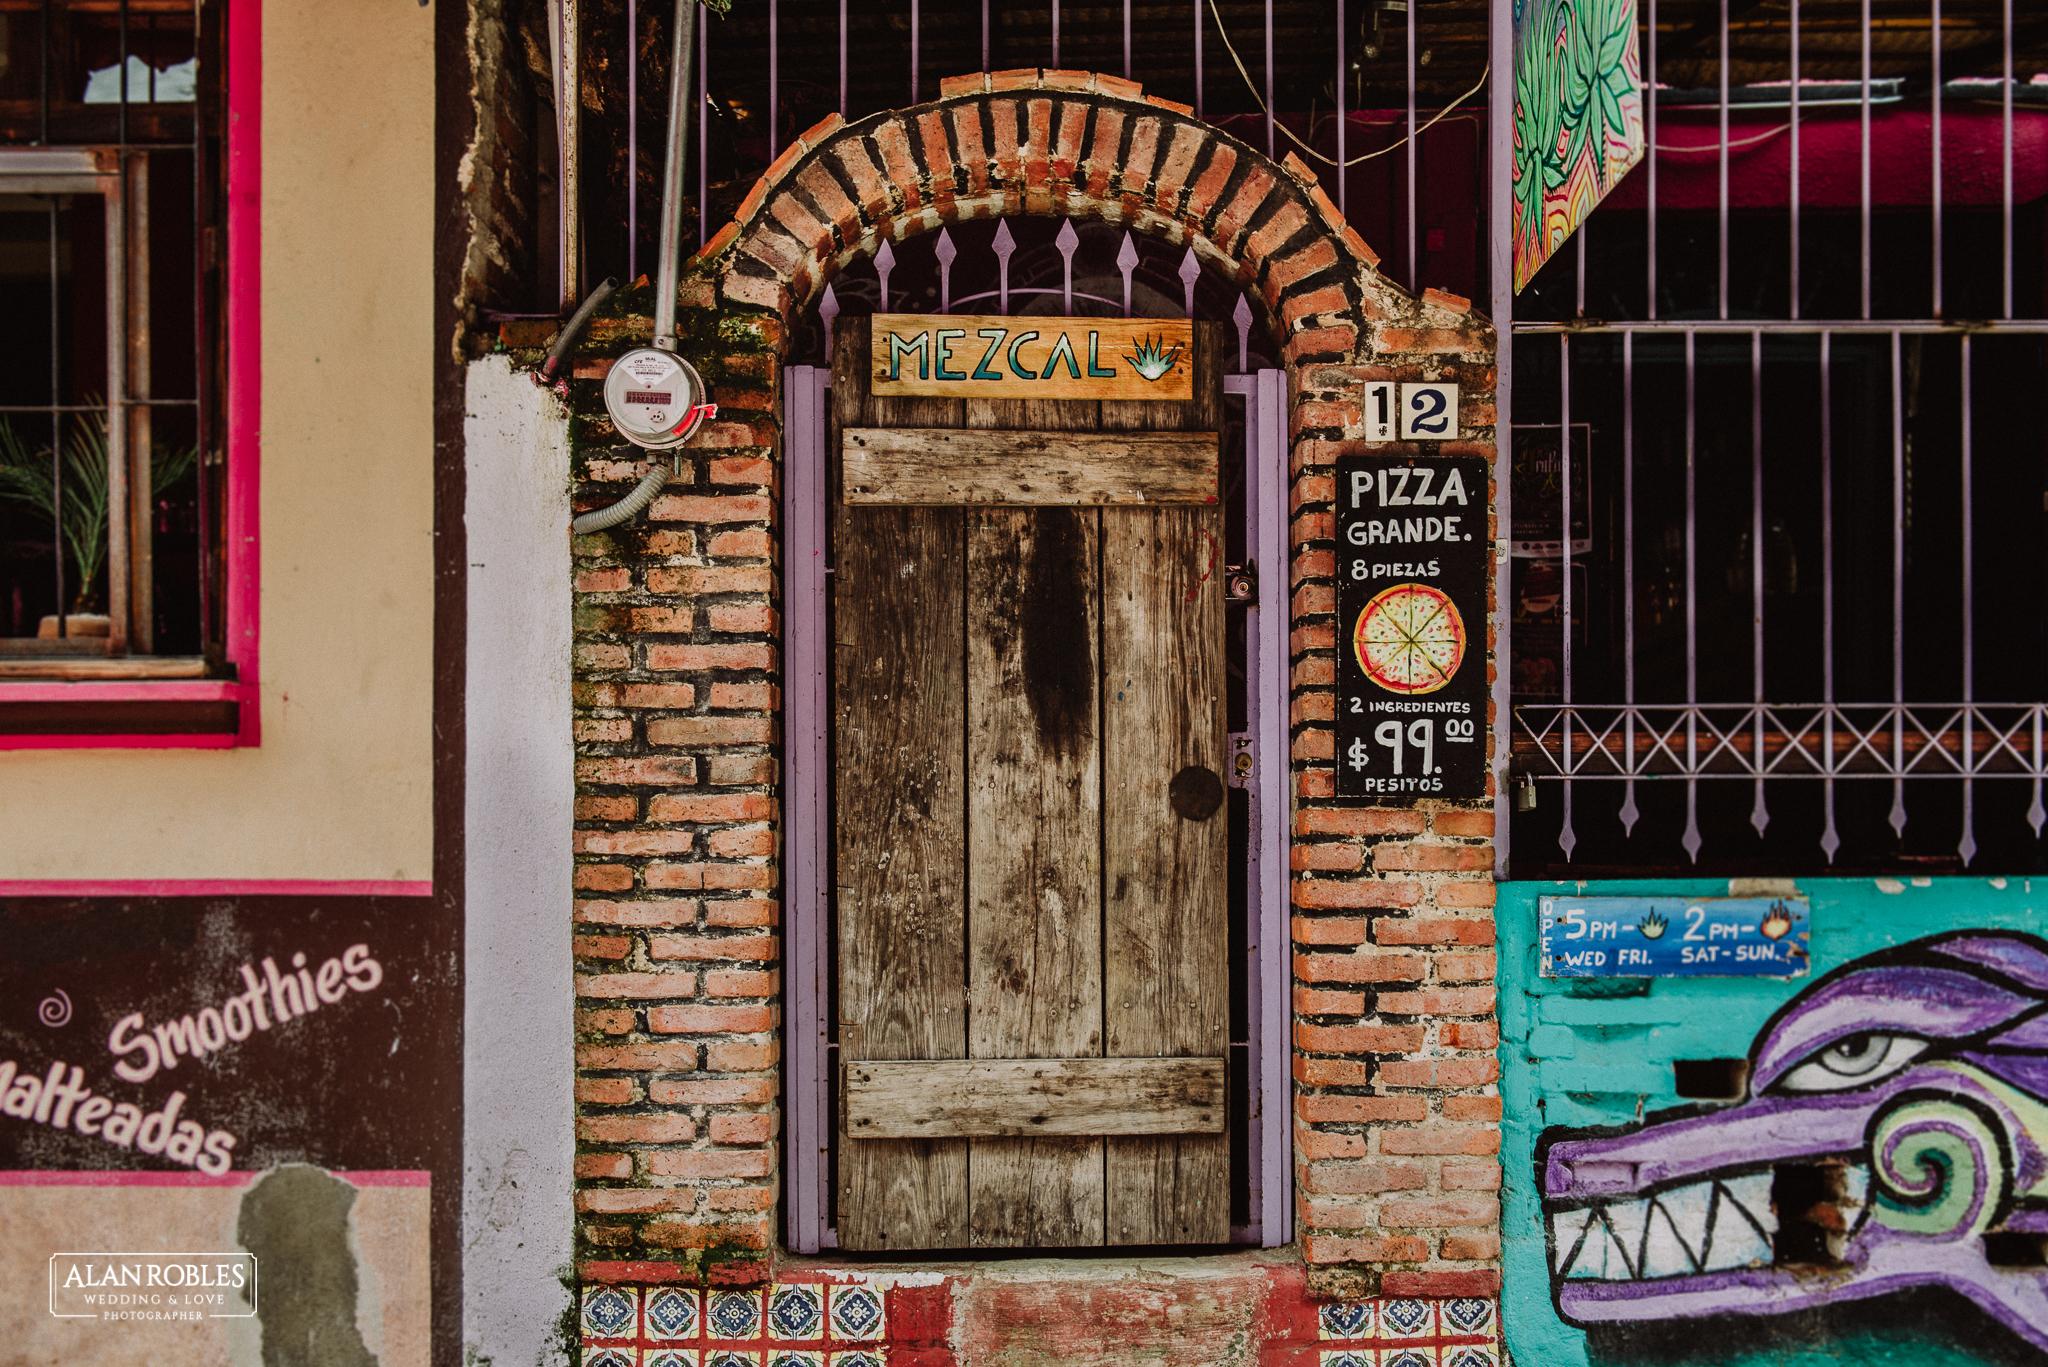 Sesion de fotos Preboda en Laguna de Chapala, Ajijic. Fotografia de bodas - Alan Robles Wedding & Love Photographer, Fotografo de bodas en Guadalajara. Arte en mural colorido, arte mexicano. Ideas para fotos de boda, fotos creativas de boda.